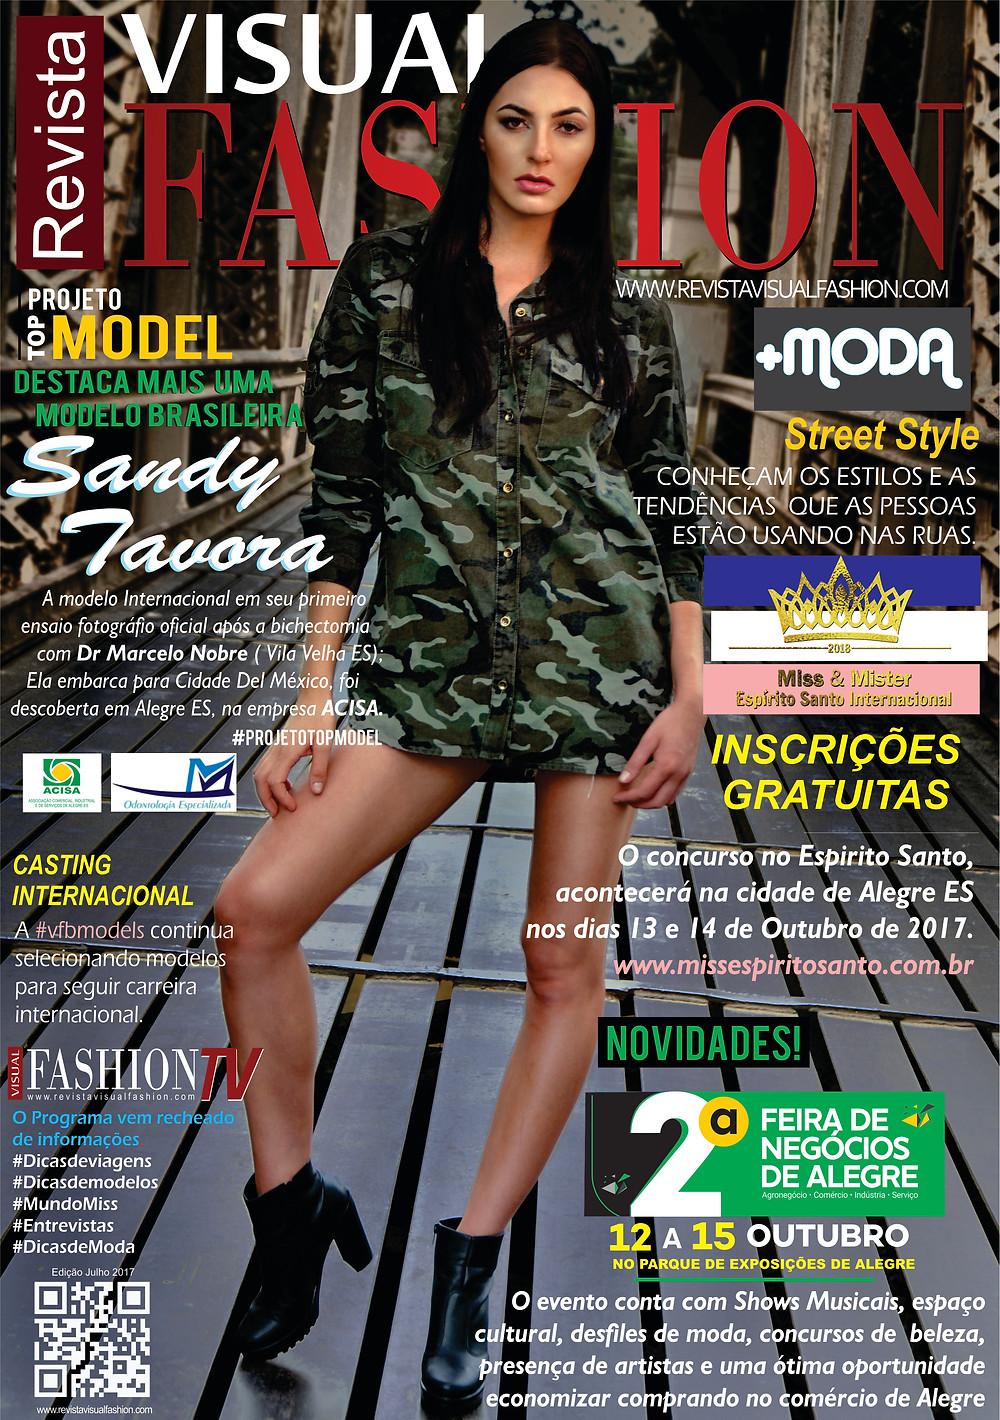 Sandy Távora | Revista Visual Fashion